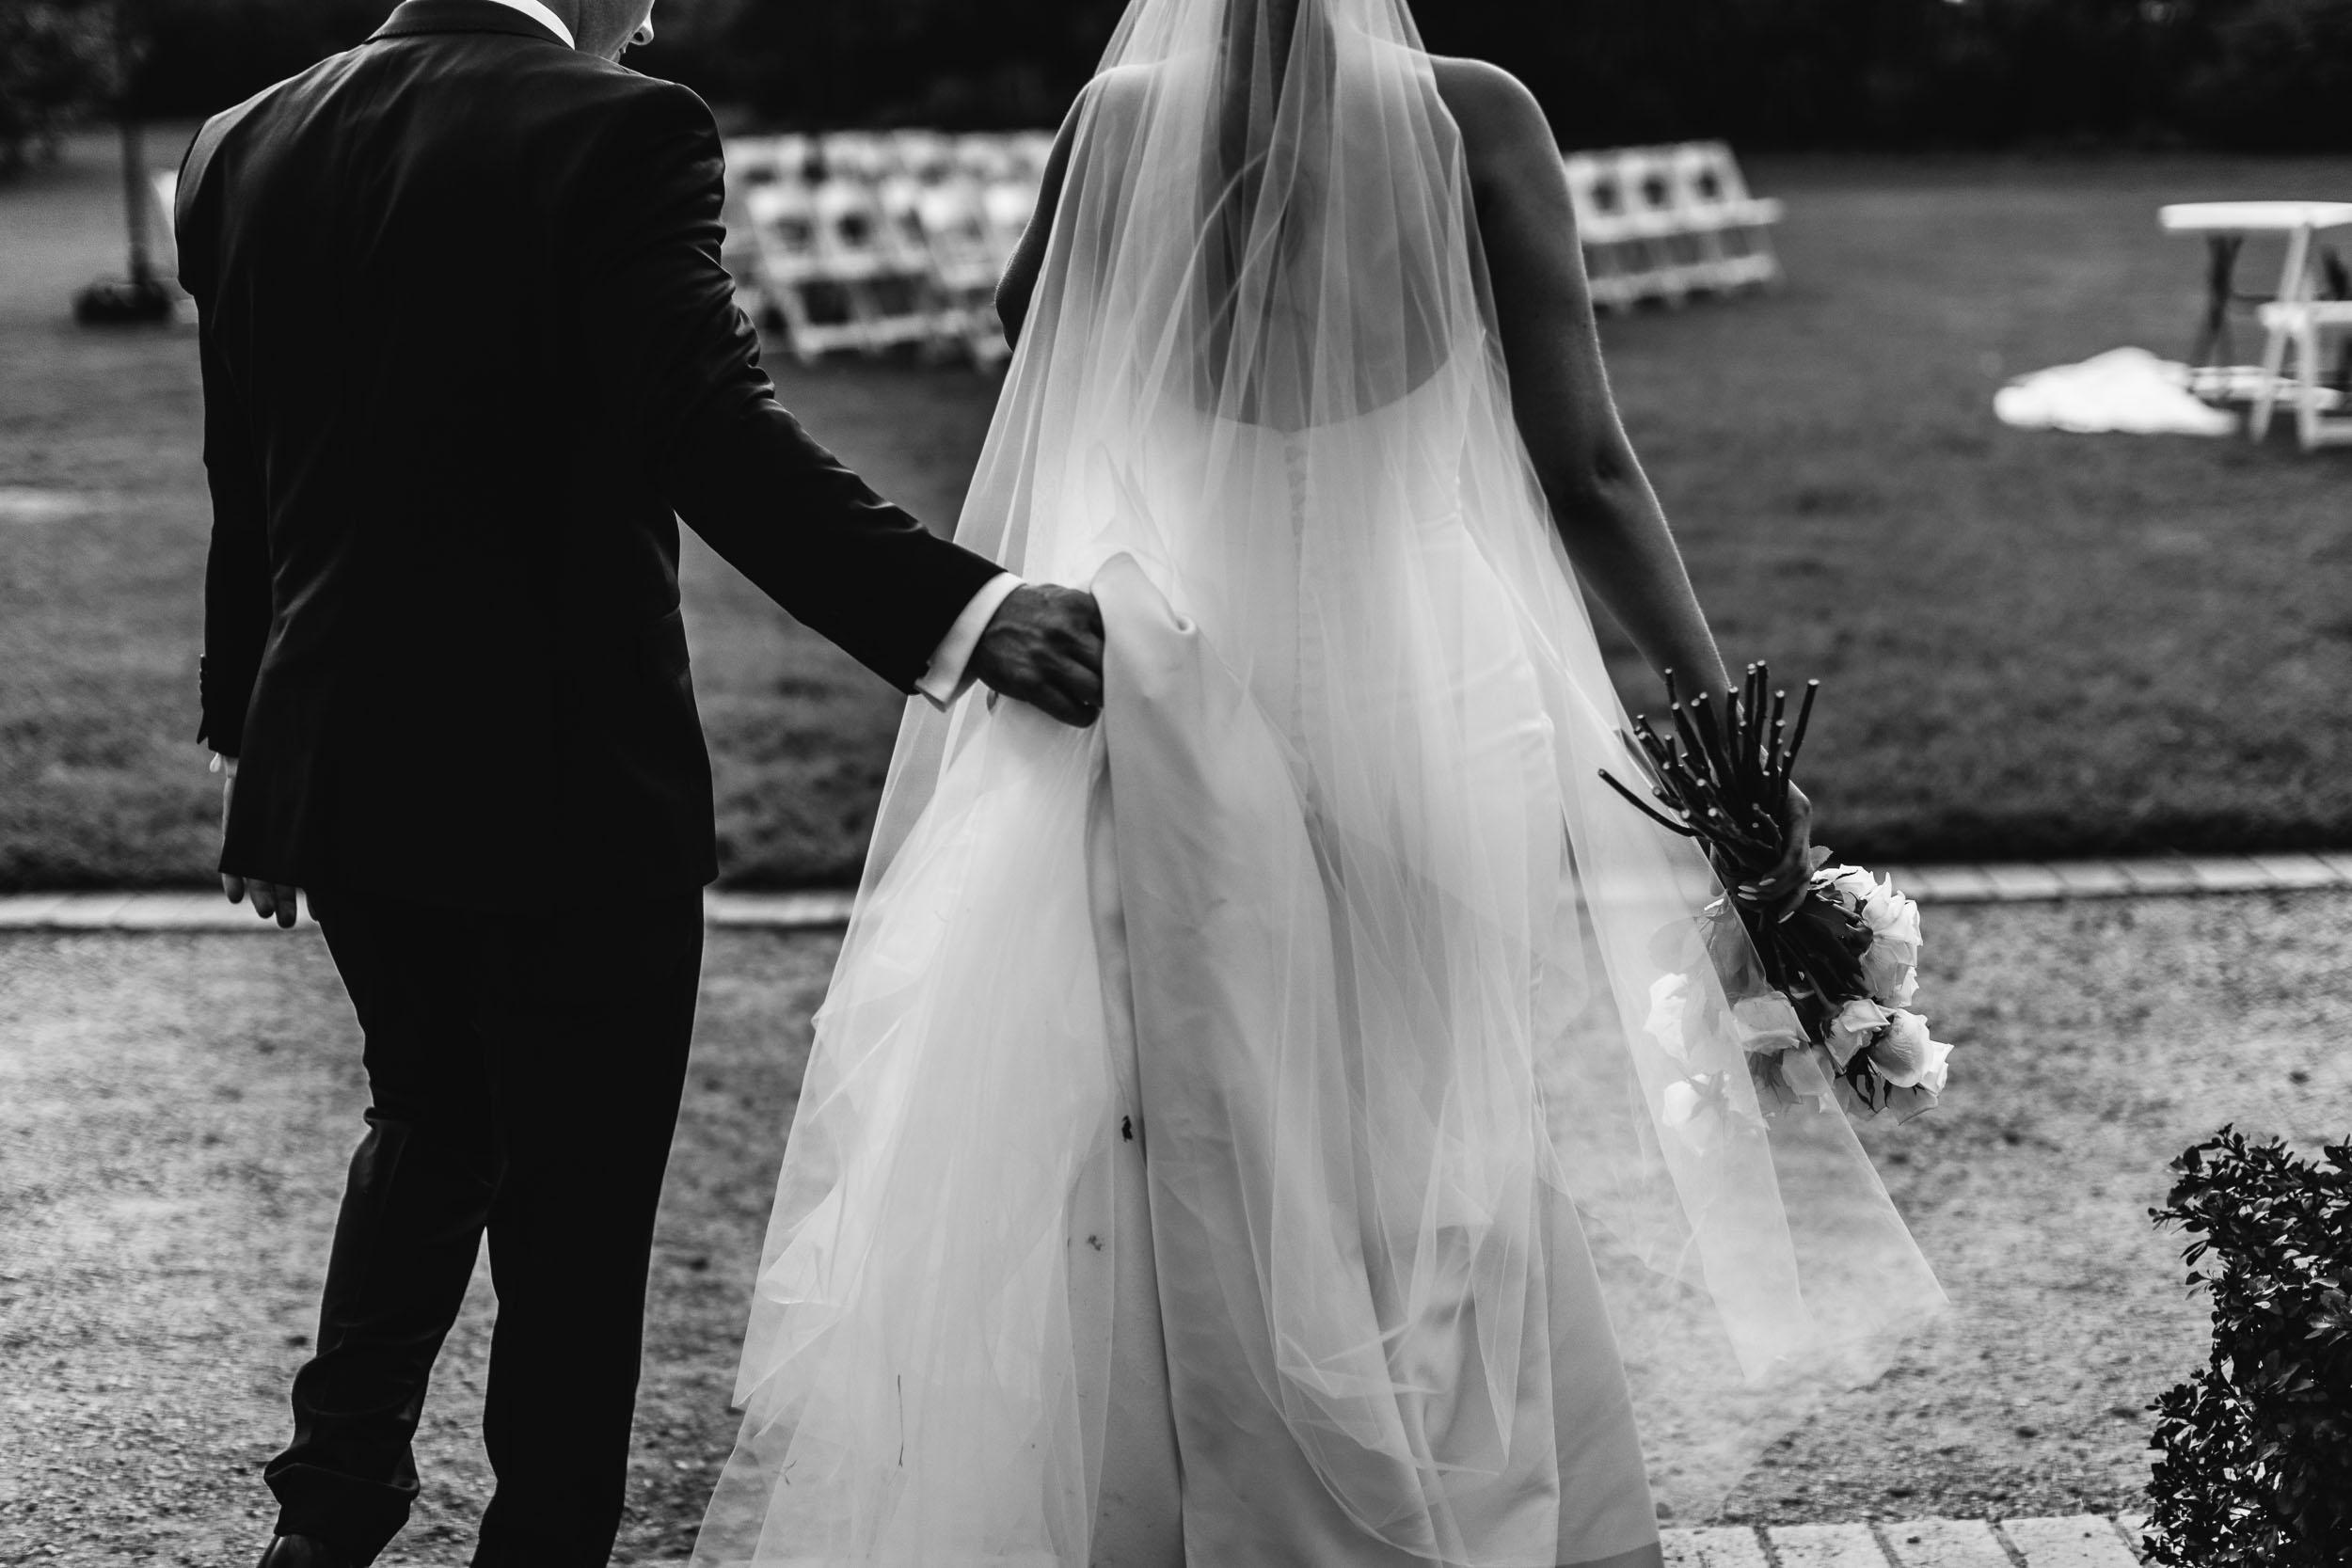 Kas-Richards-Melbourne-Garden-Wedding-Aerial-South-Whark-Georgia-Young-Couture-310.jpg